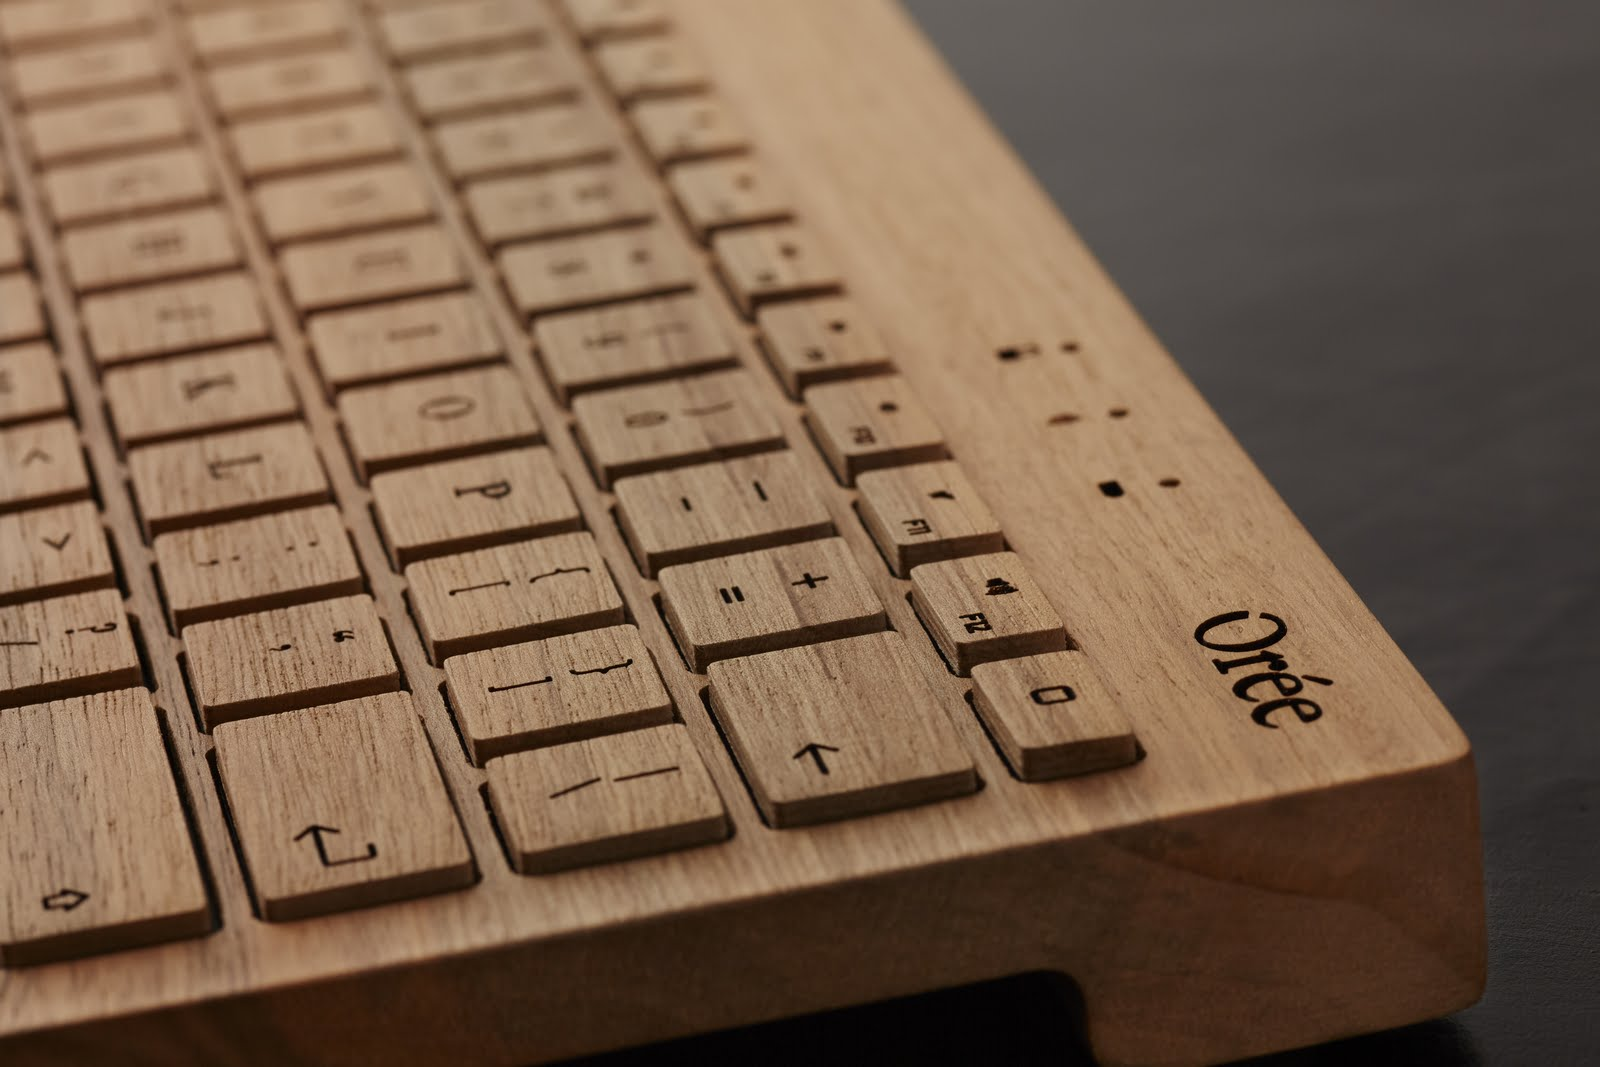 Oreeキーボードのレーザー彫刻 - 完成写真